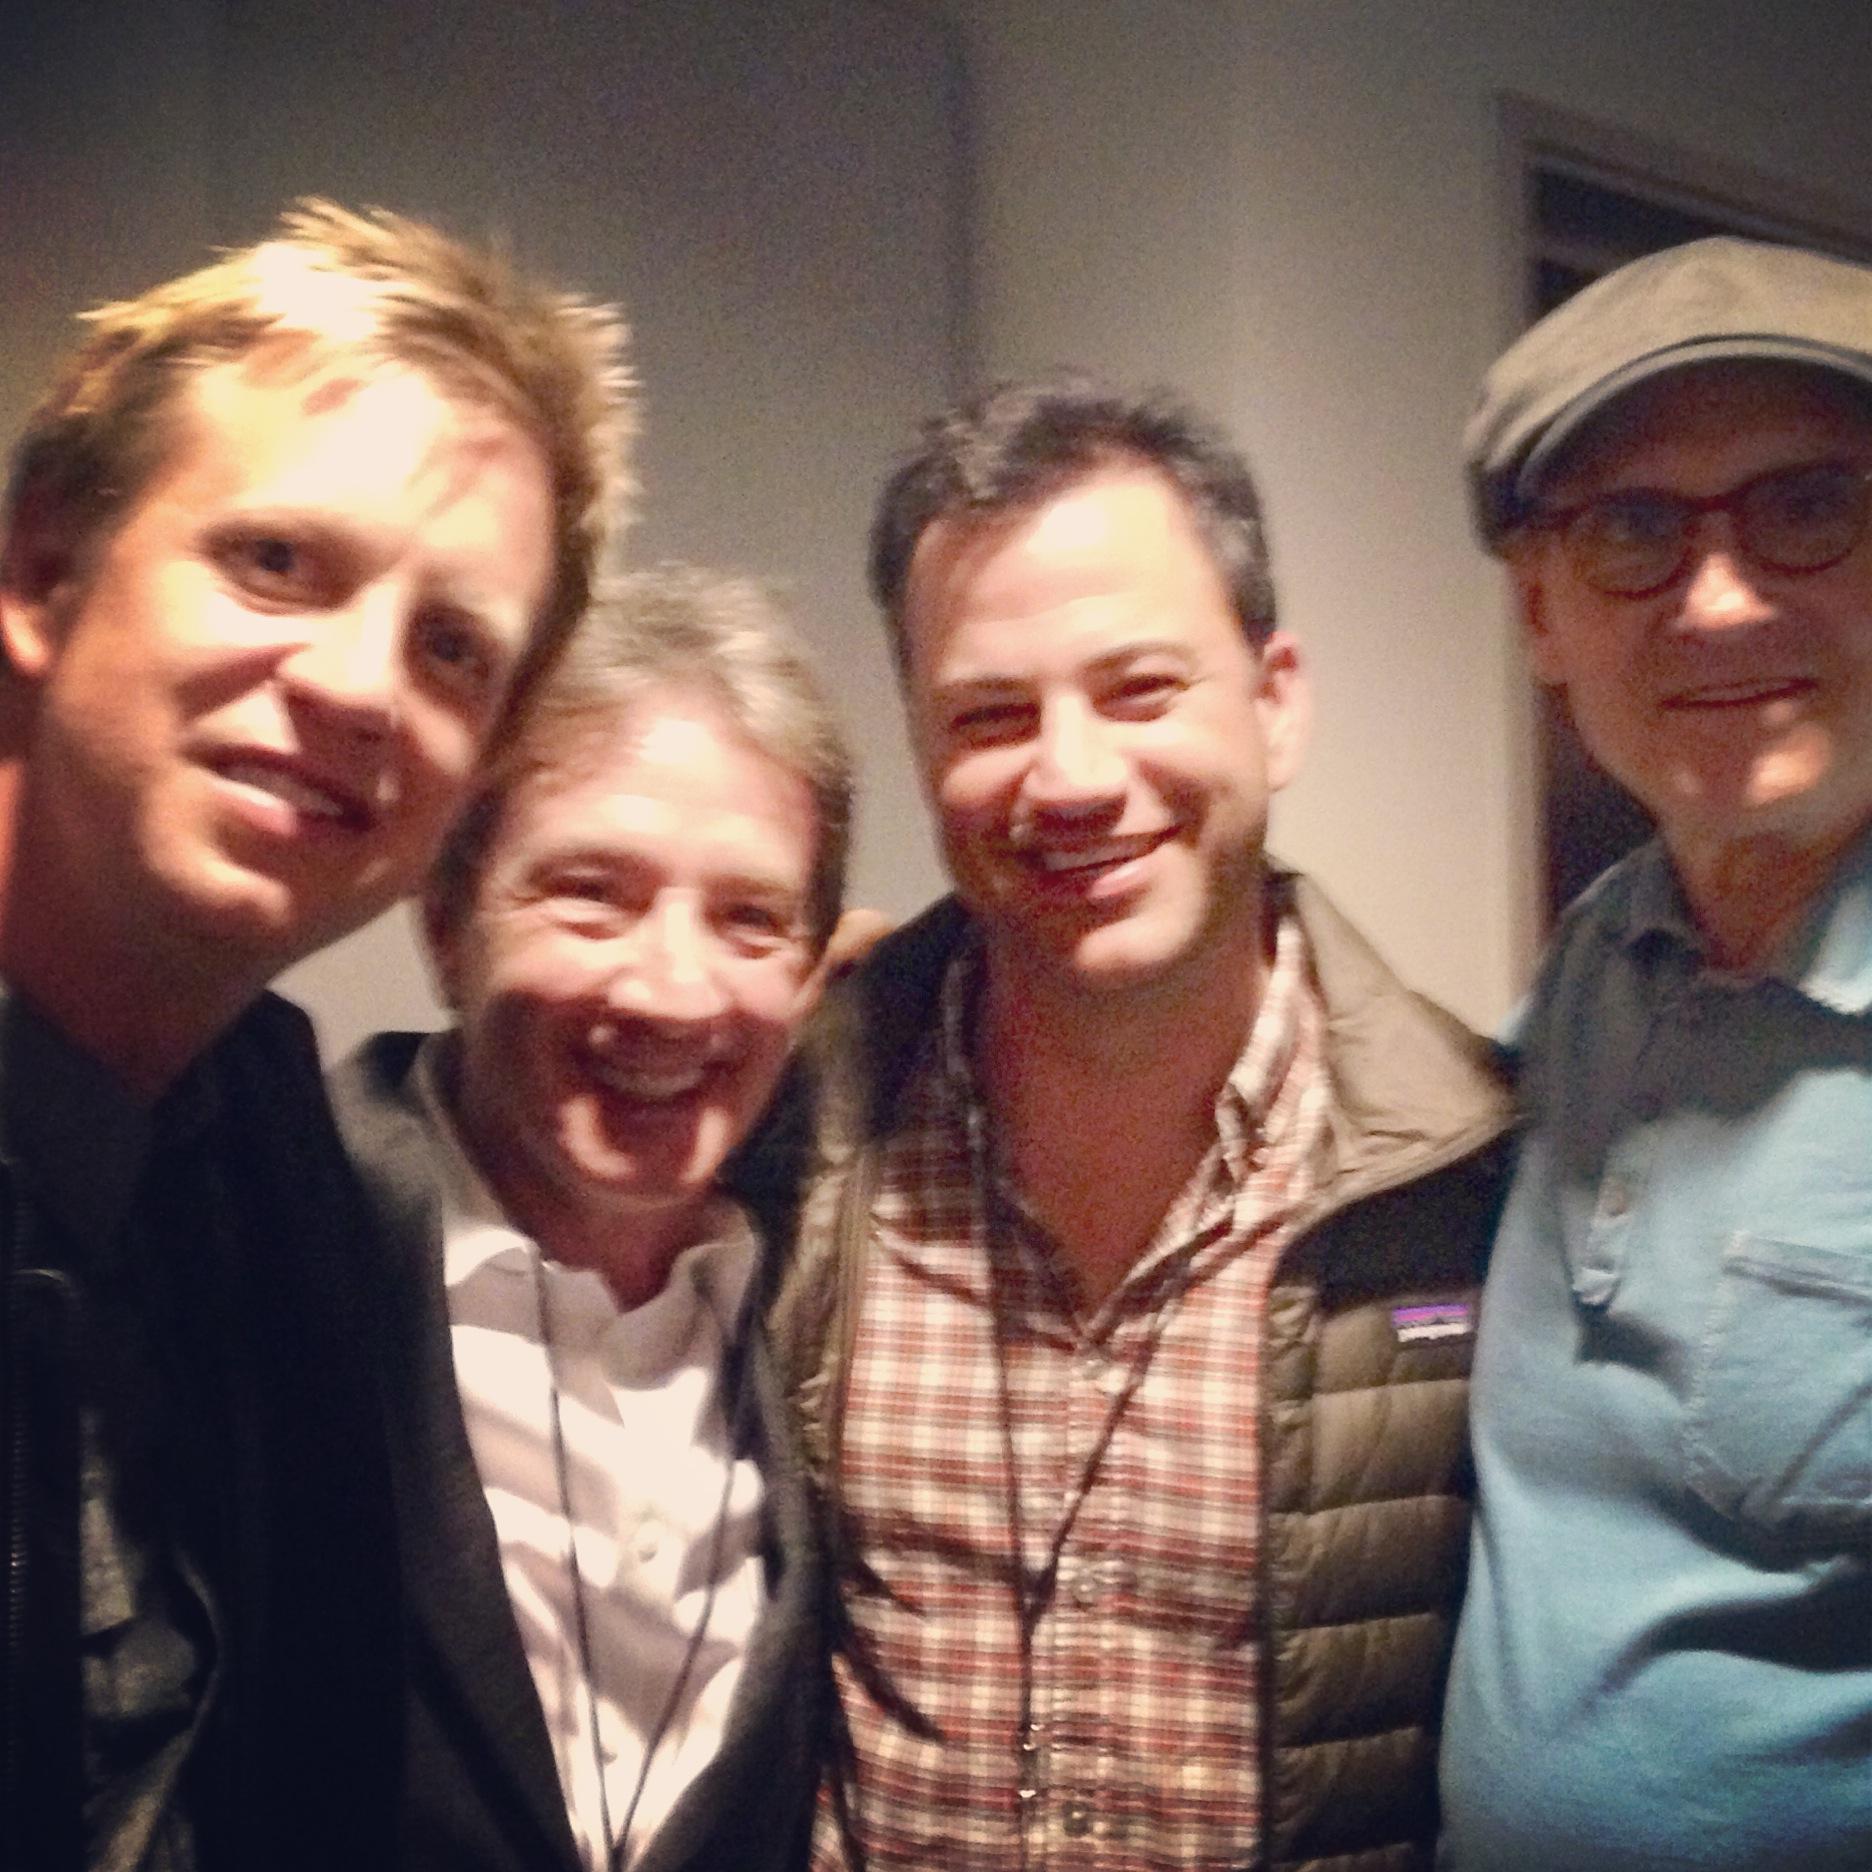 w/ my 3 bosses Martin Short, Jimmy Kimmel & James Taylor @ JT Hollywood Bowl show May 2014